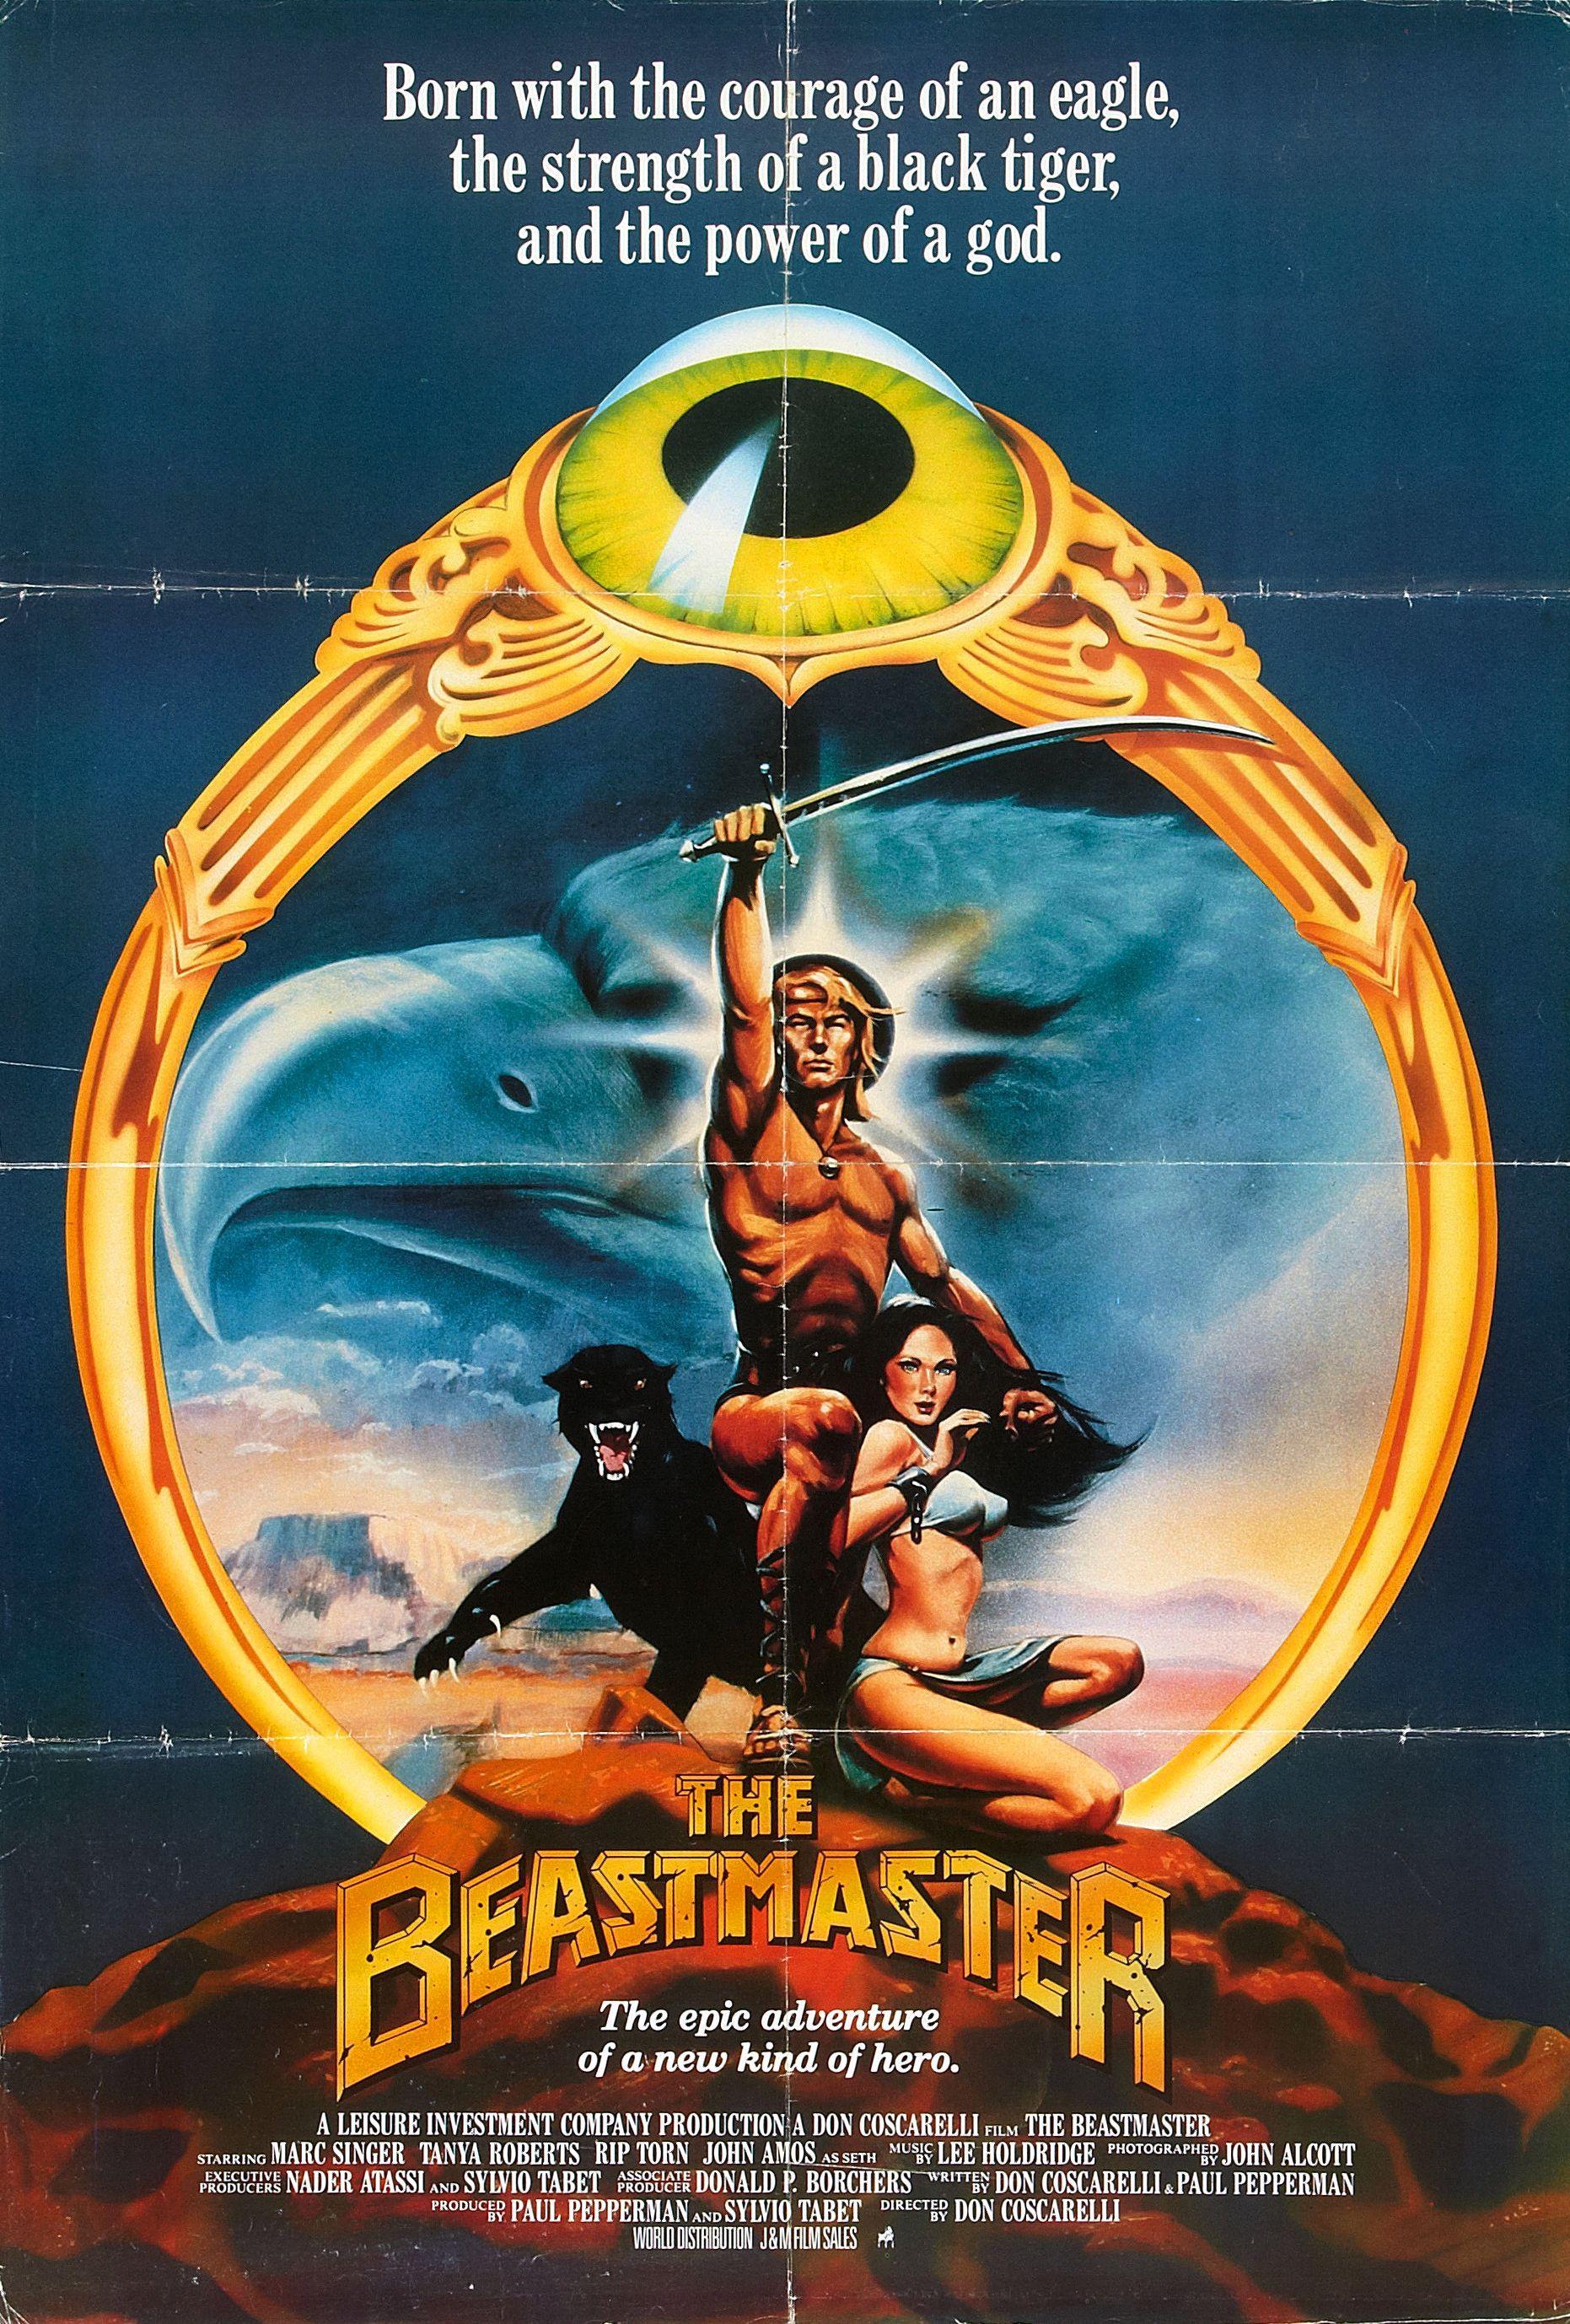 Beastmaster Poster 02 Jpg Jpeg Image 1862 2756 Pixels